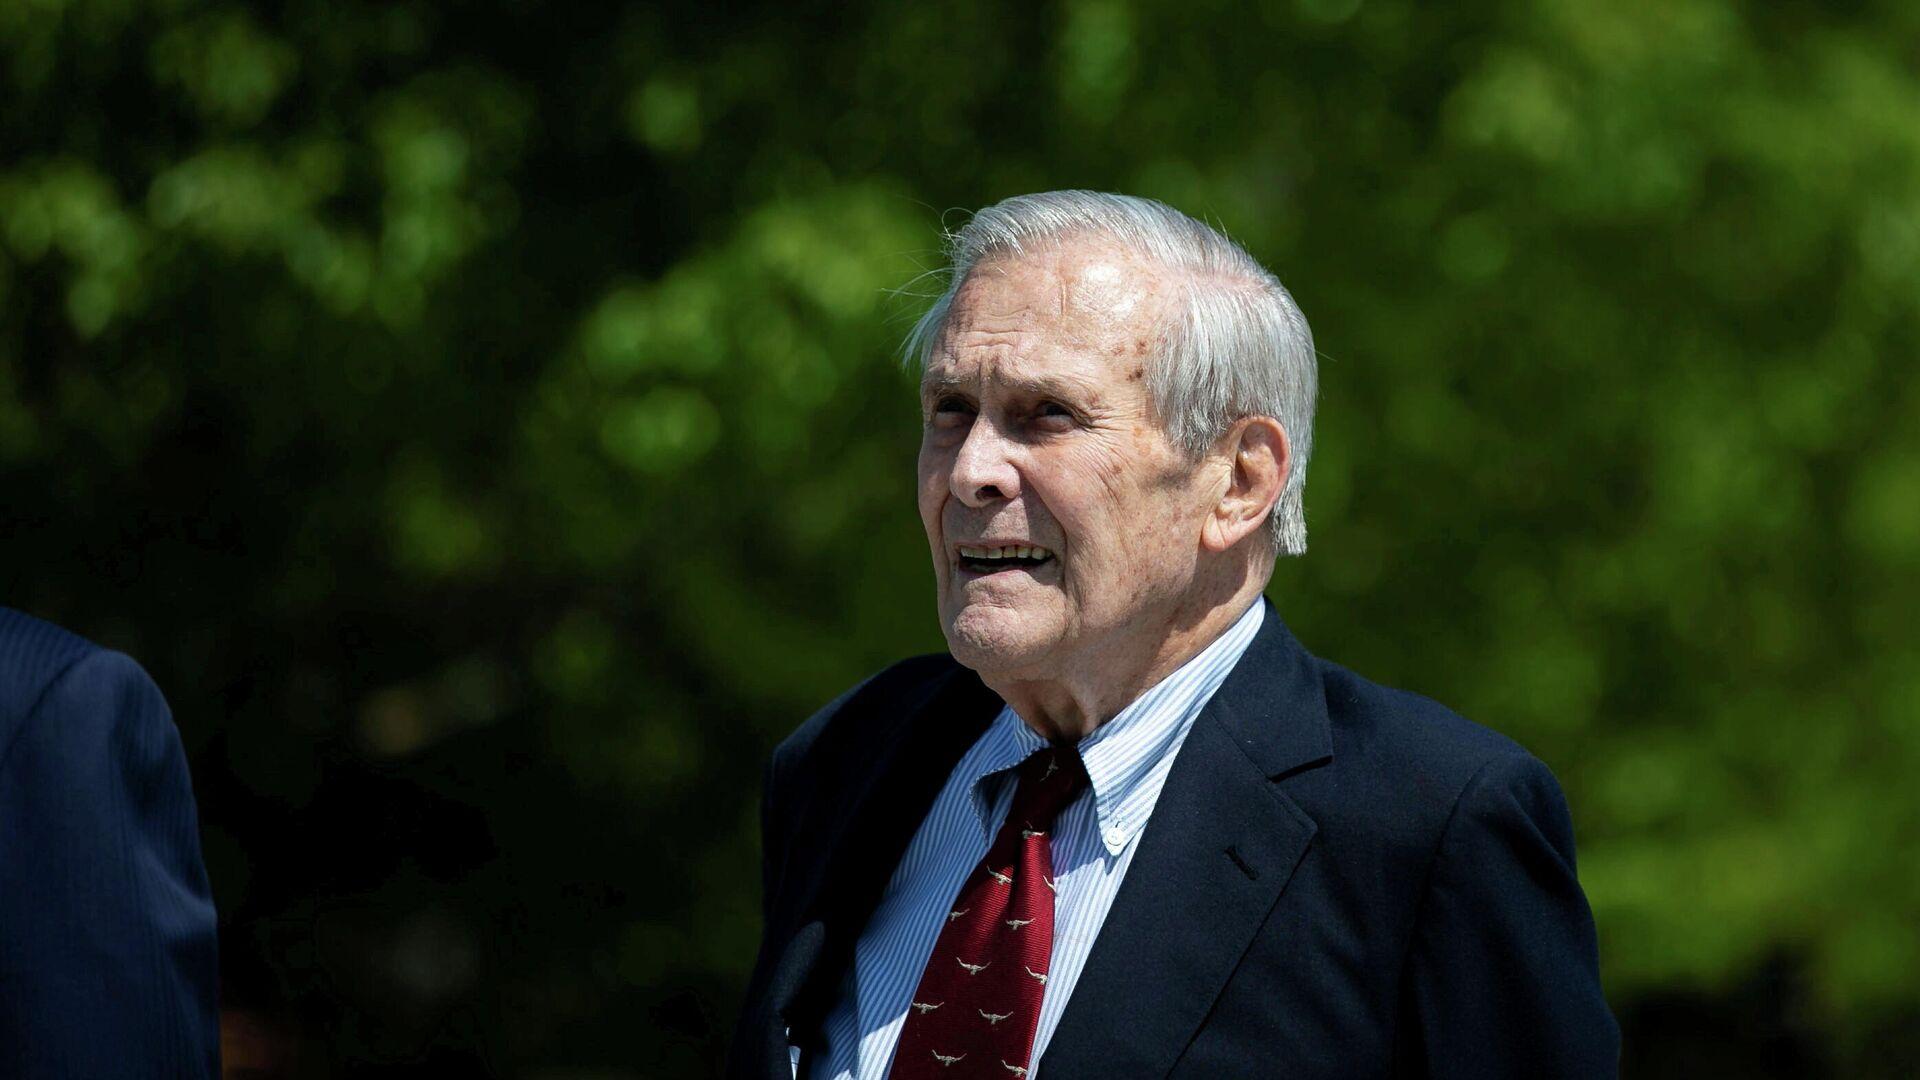 Donald Rumsfeld, exsecretario de Defensa de EEUU - Sputnik Mundo, 1920, 30.06.2021